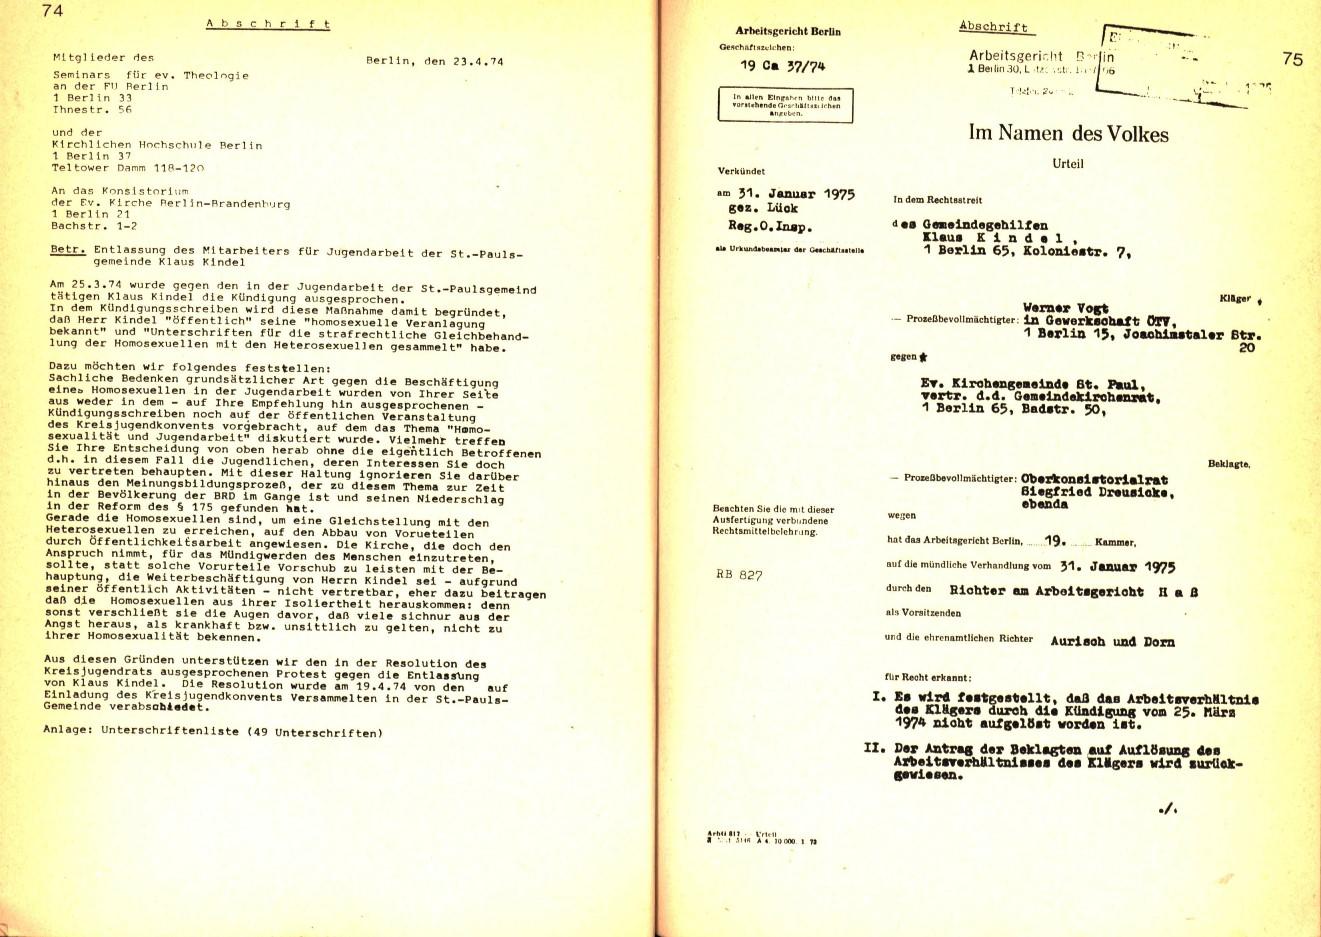 Berlin_VDS_Aktionskomitee_1975_BerufsverboteII_39